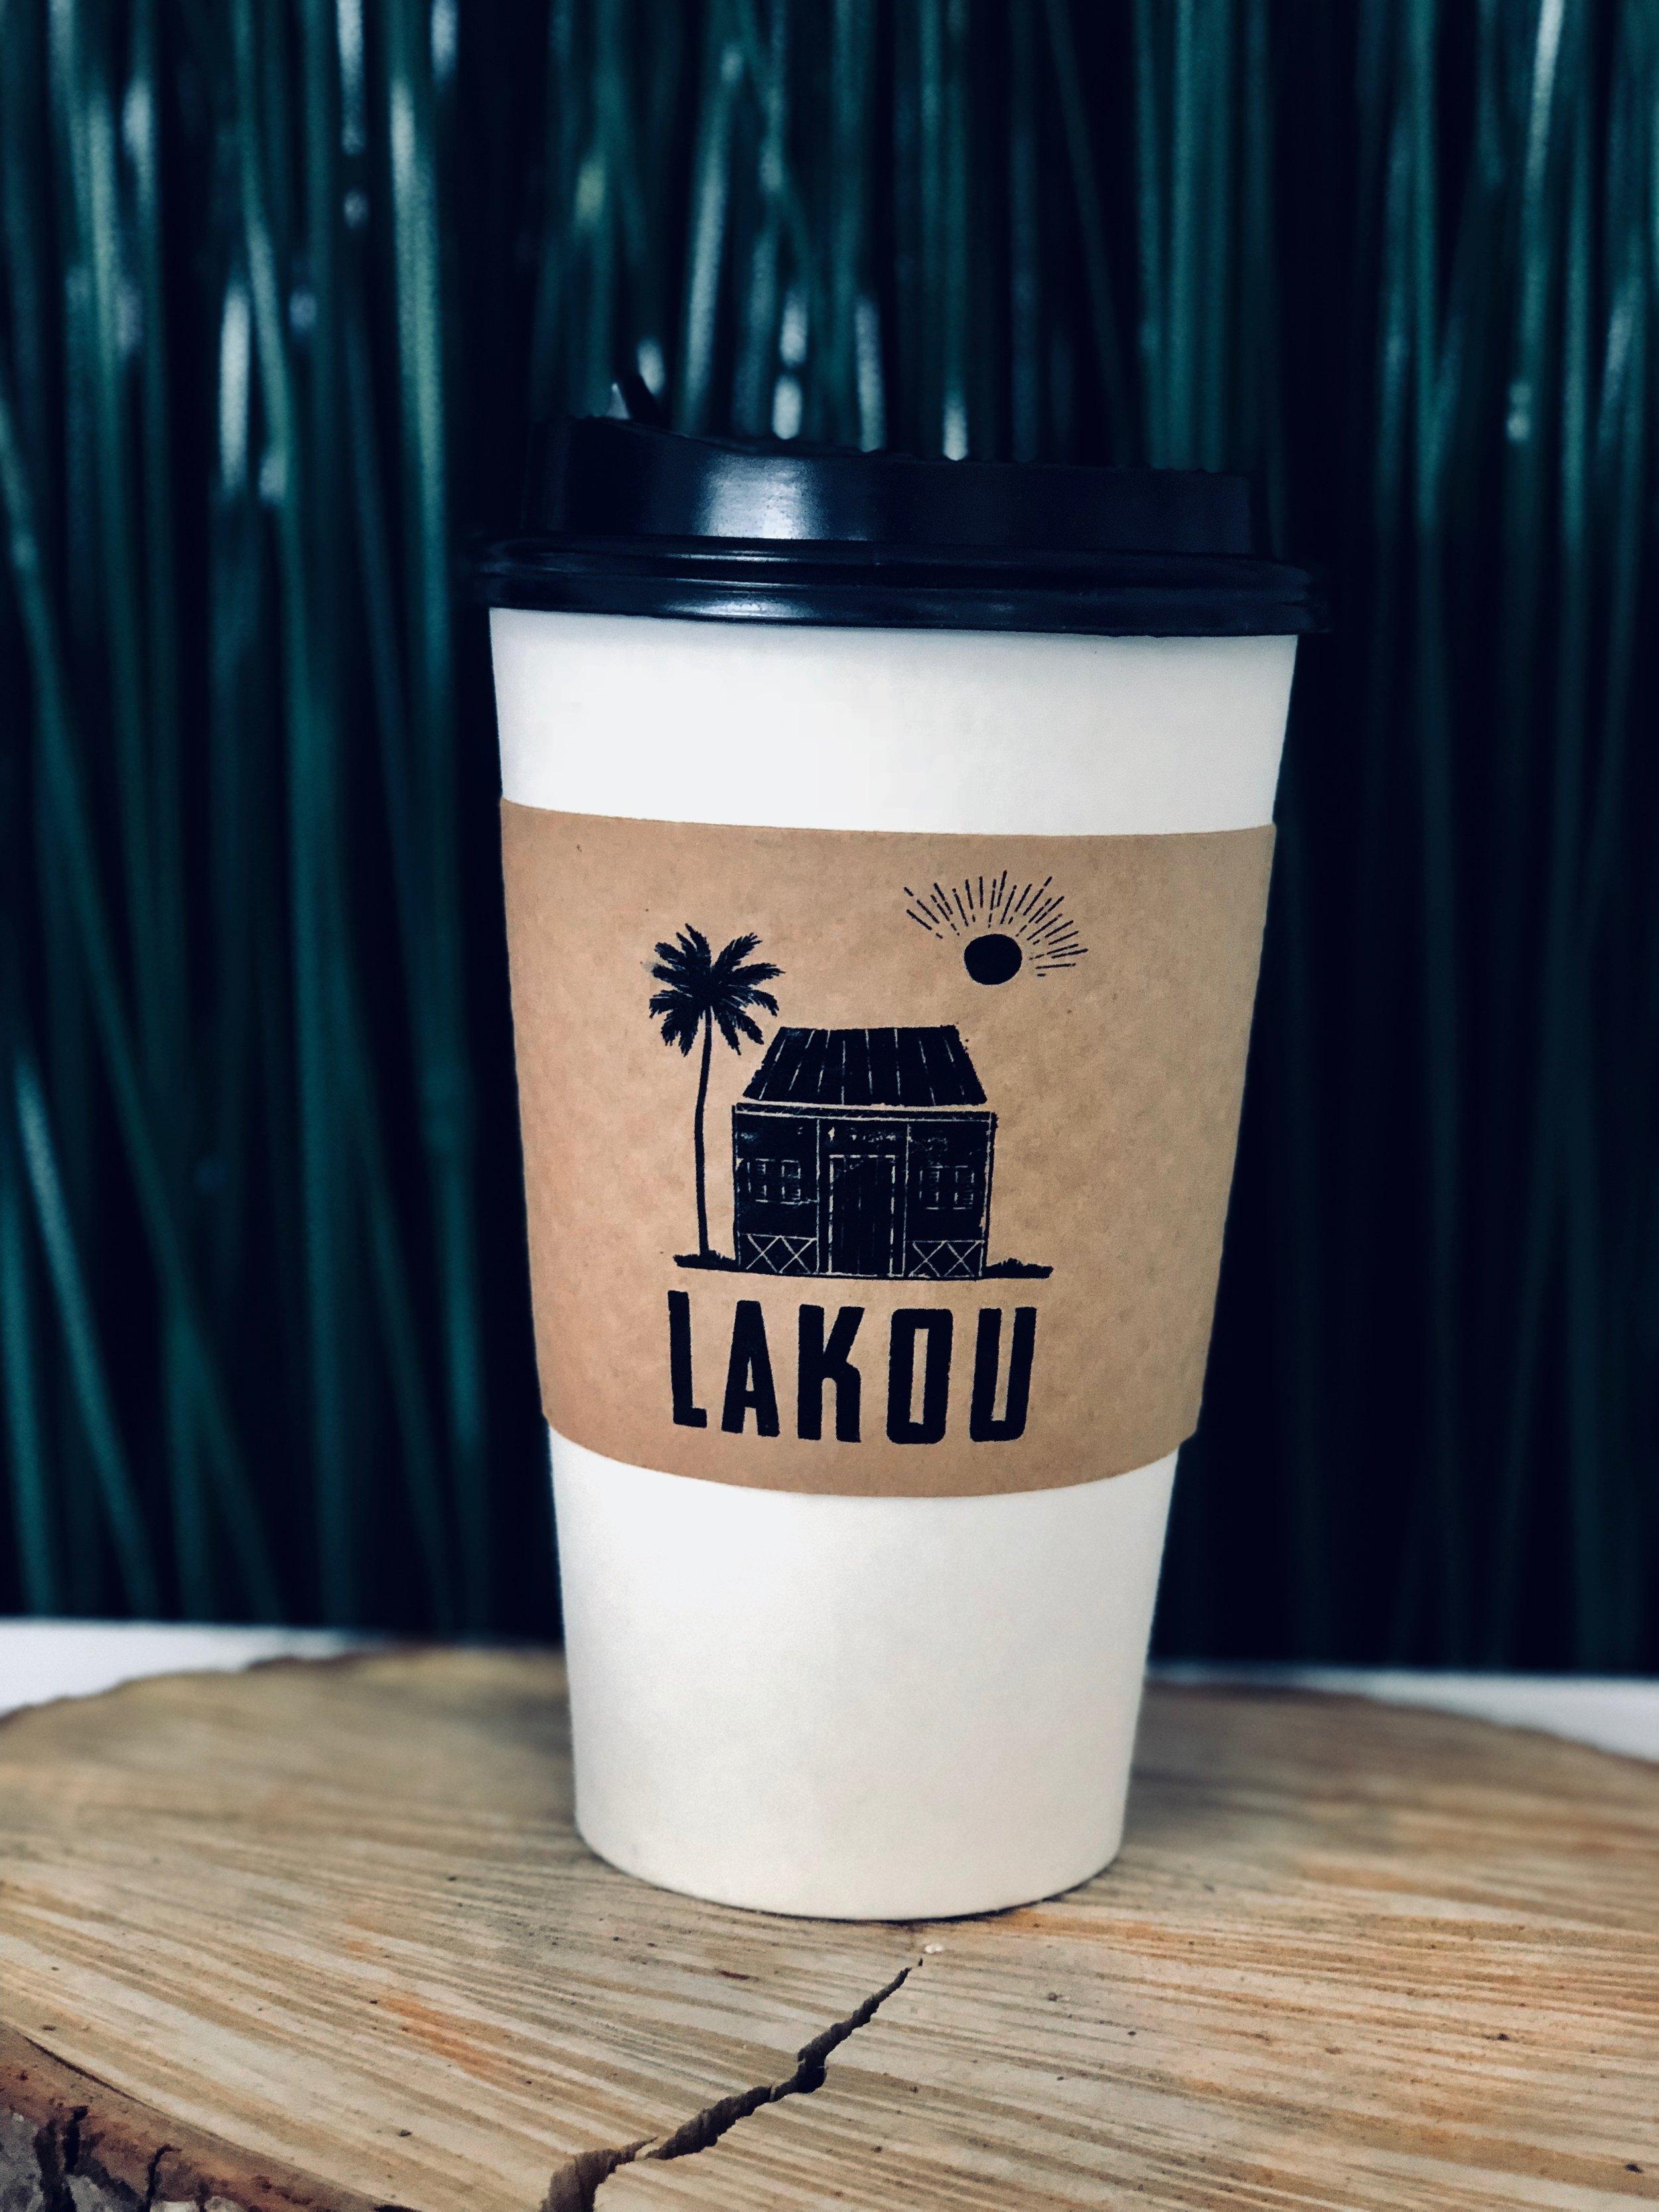 COFFEE - Espresso AmericanoCortadoCappuccinoLatteMocha LatteOTHER BEVERAGESDrip CoffeeCold Brew CoffeeHot CocoaChai LatteGolden LatteAdd-Ons:Oat, Almond or Soy MilkCaramel, Vanilla or Hazelnut SyrupExtra Espresso Shots